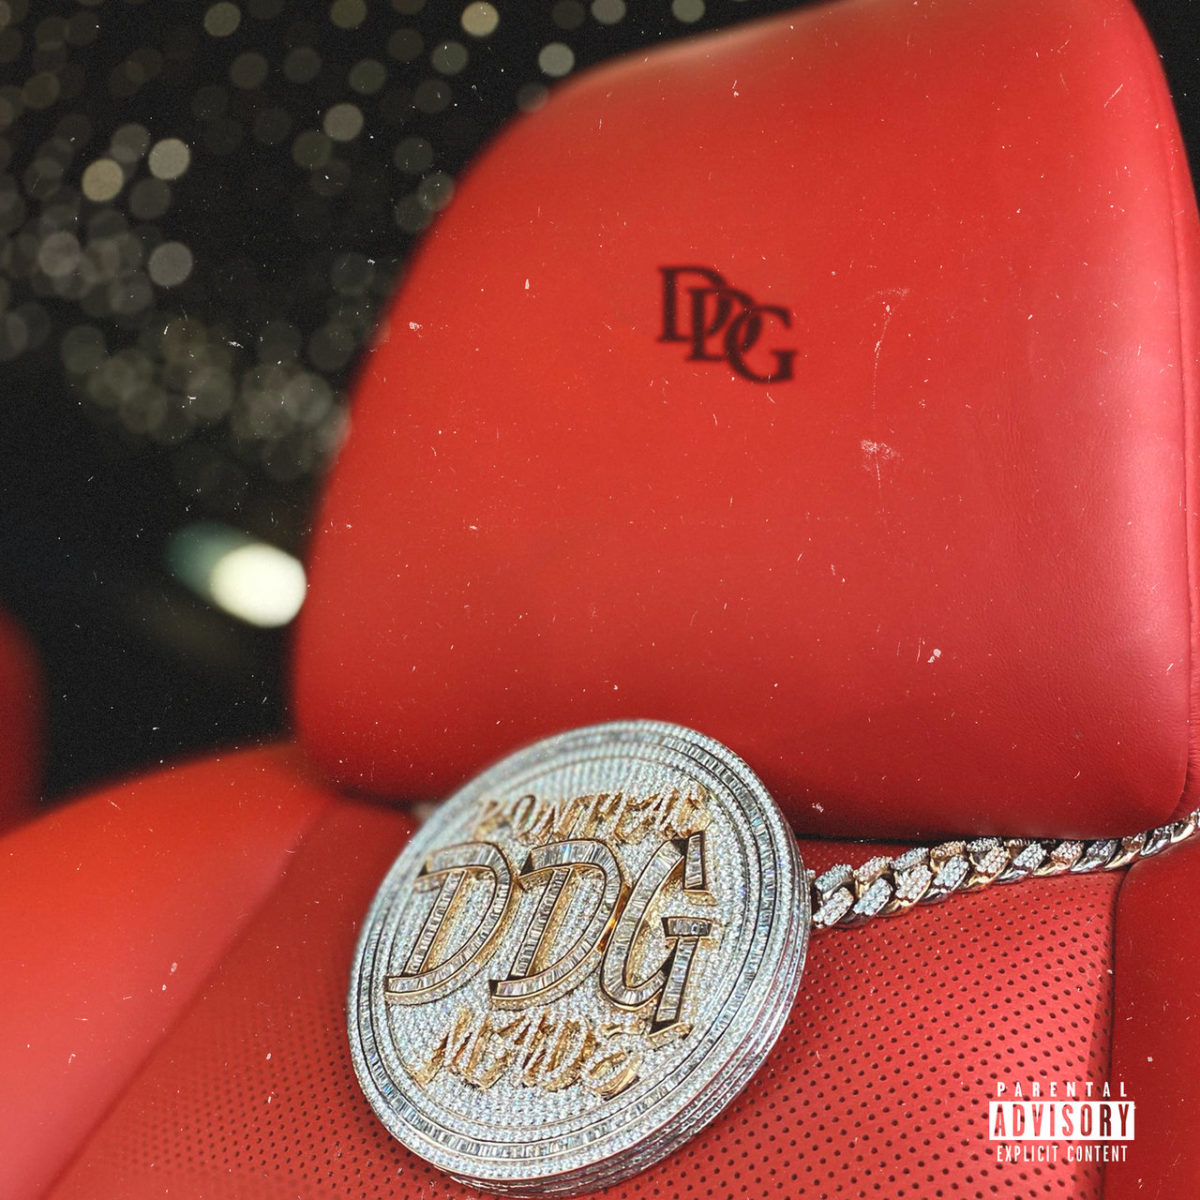 DDG - Exotics (Cover)